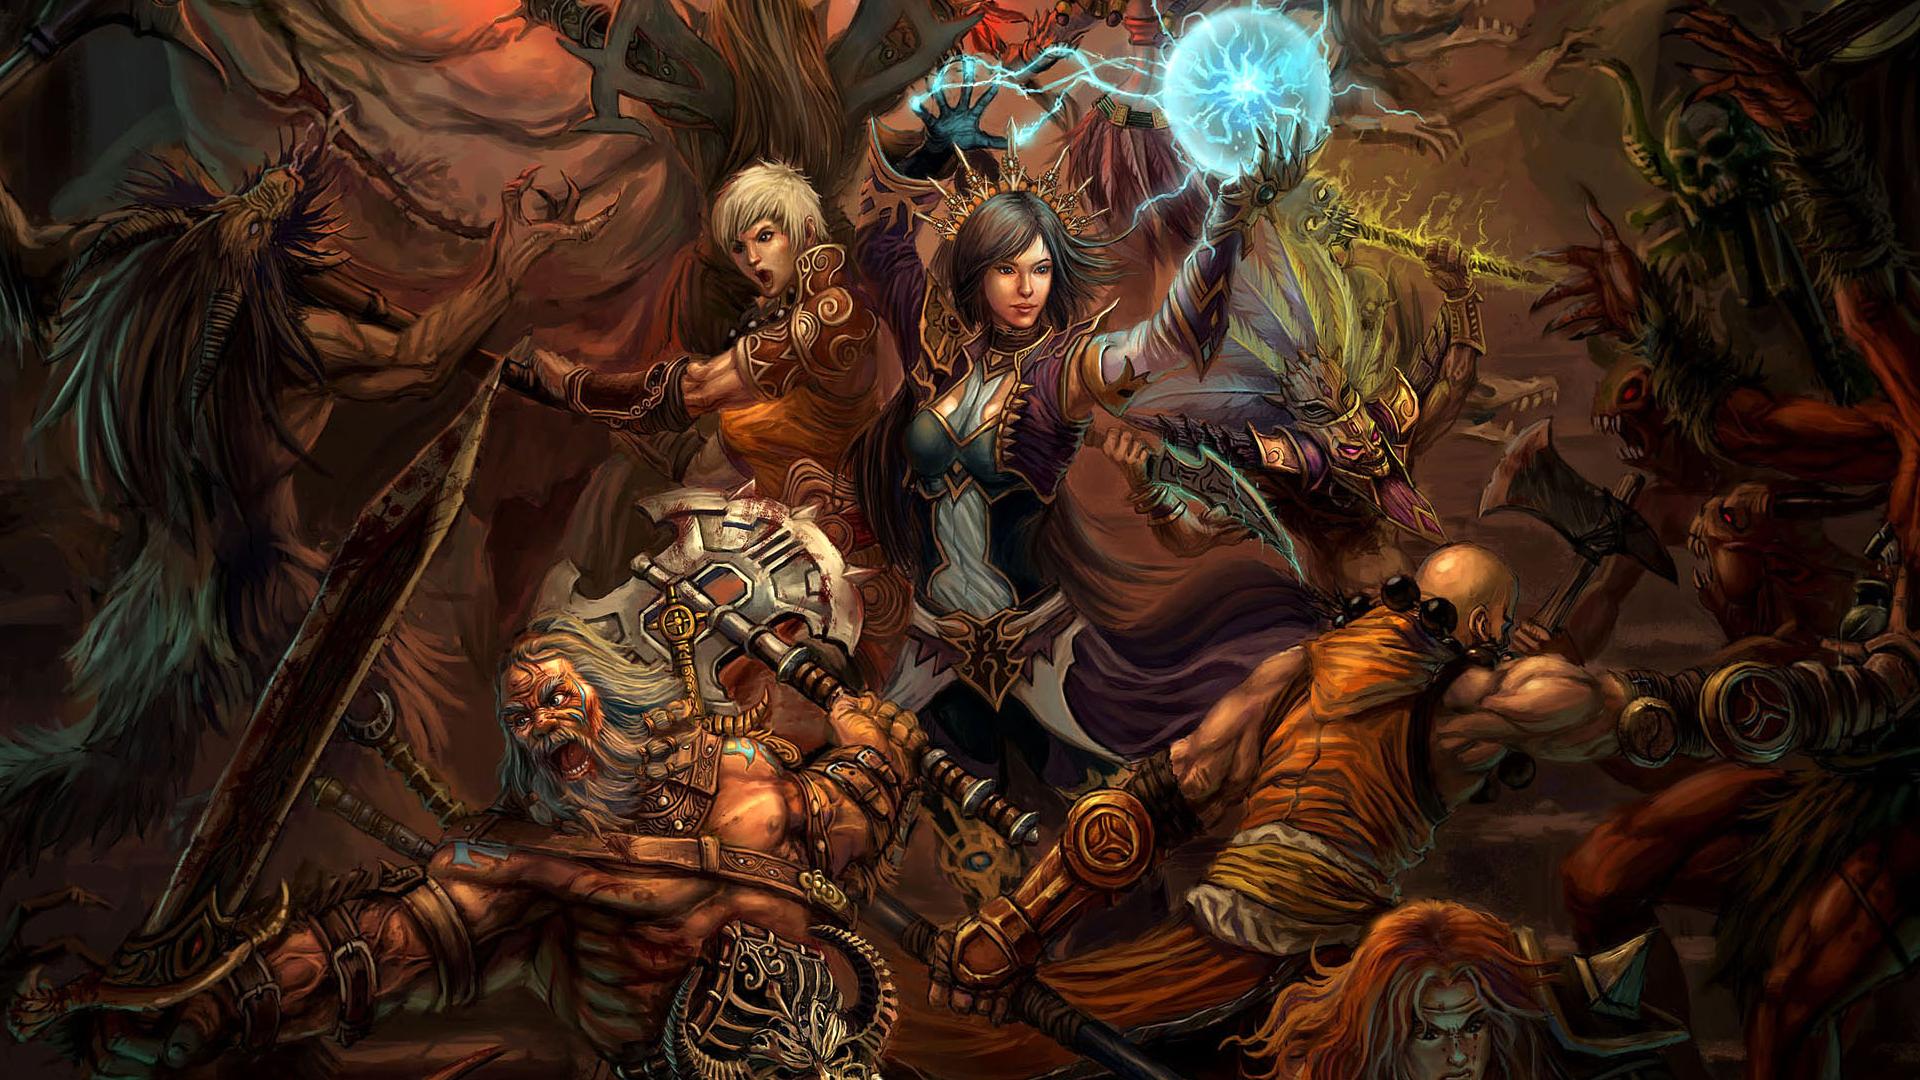 Diablo 3 review | GamesRadar+